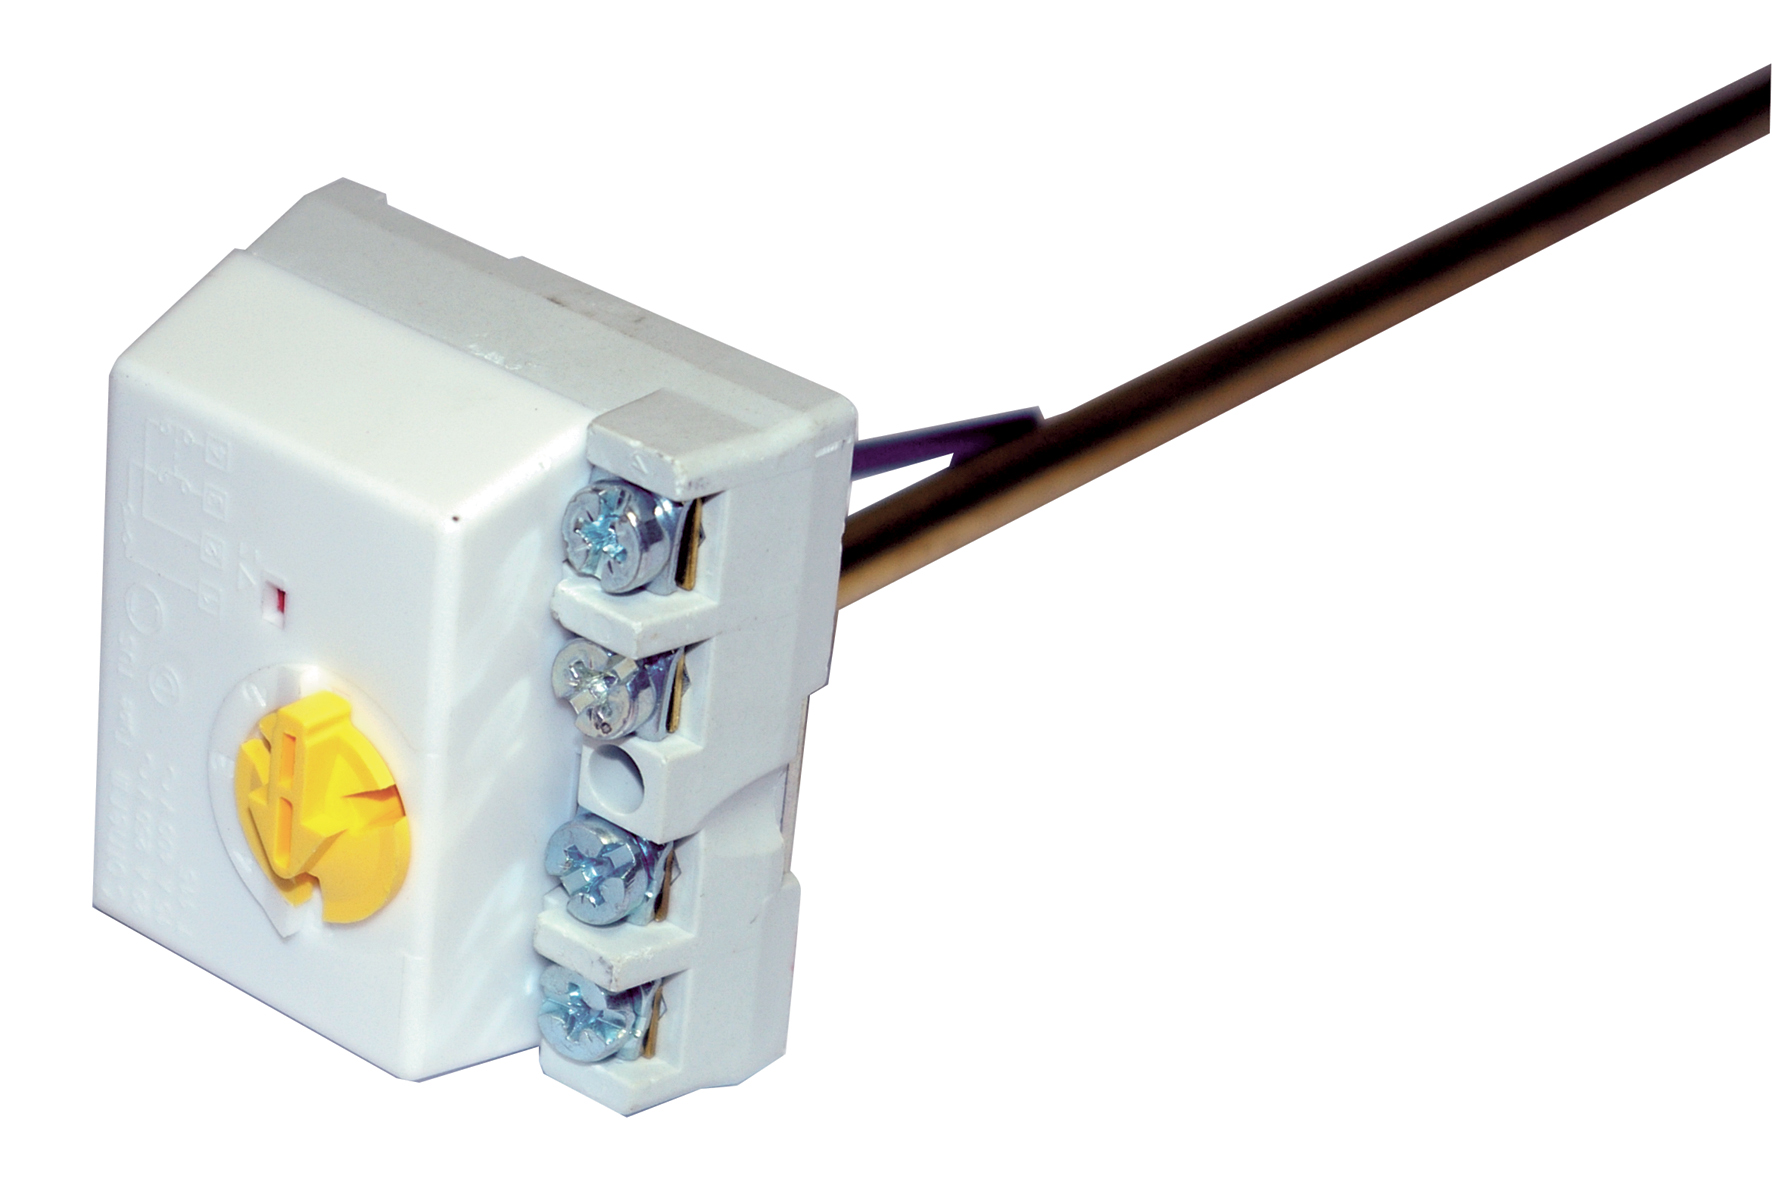 Thermostat canne thermostat chauffe eau - Thermostat chauffe eau electrique ...